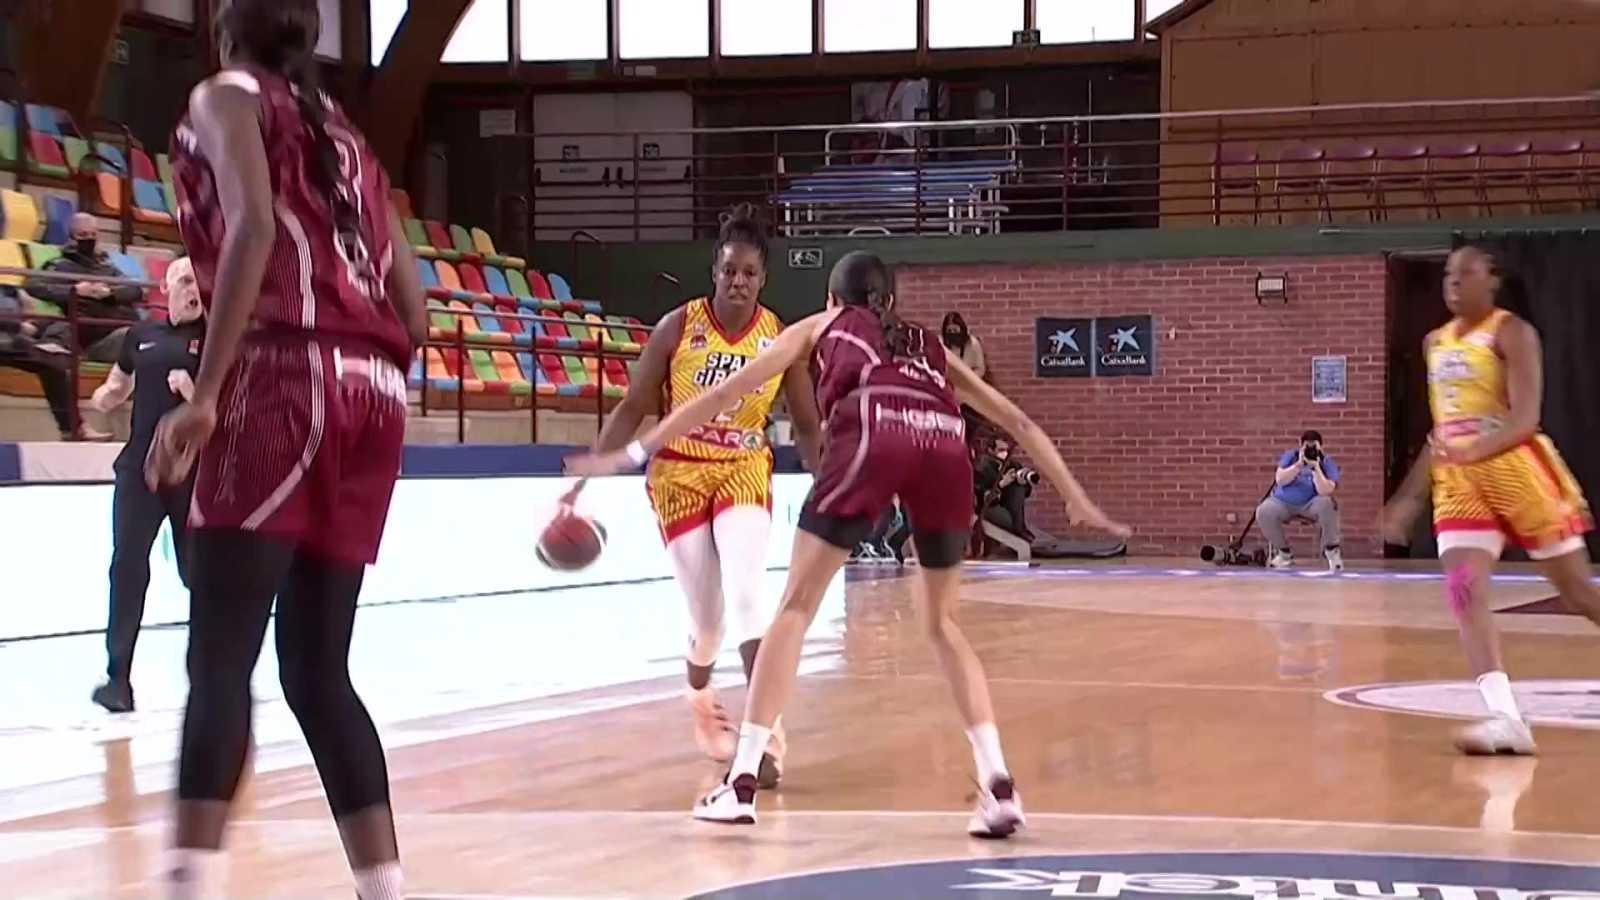 Baloncesto - Liga femenina Endesa. 18º jornada: Lointek Gernika - Spar Girona - ver ahora